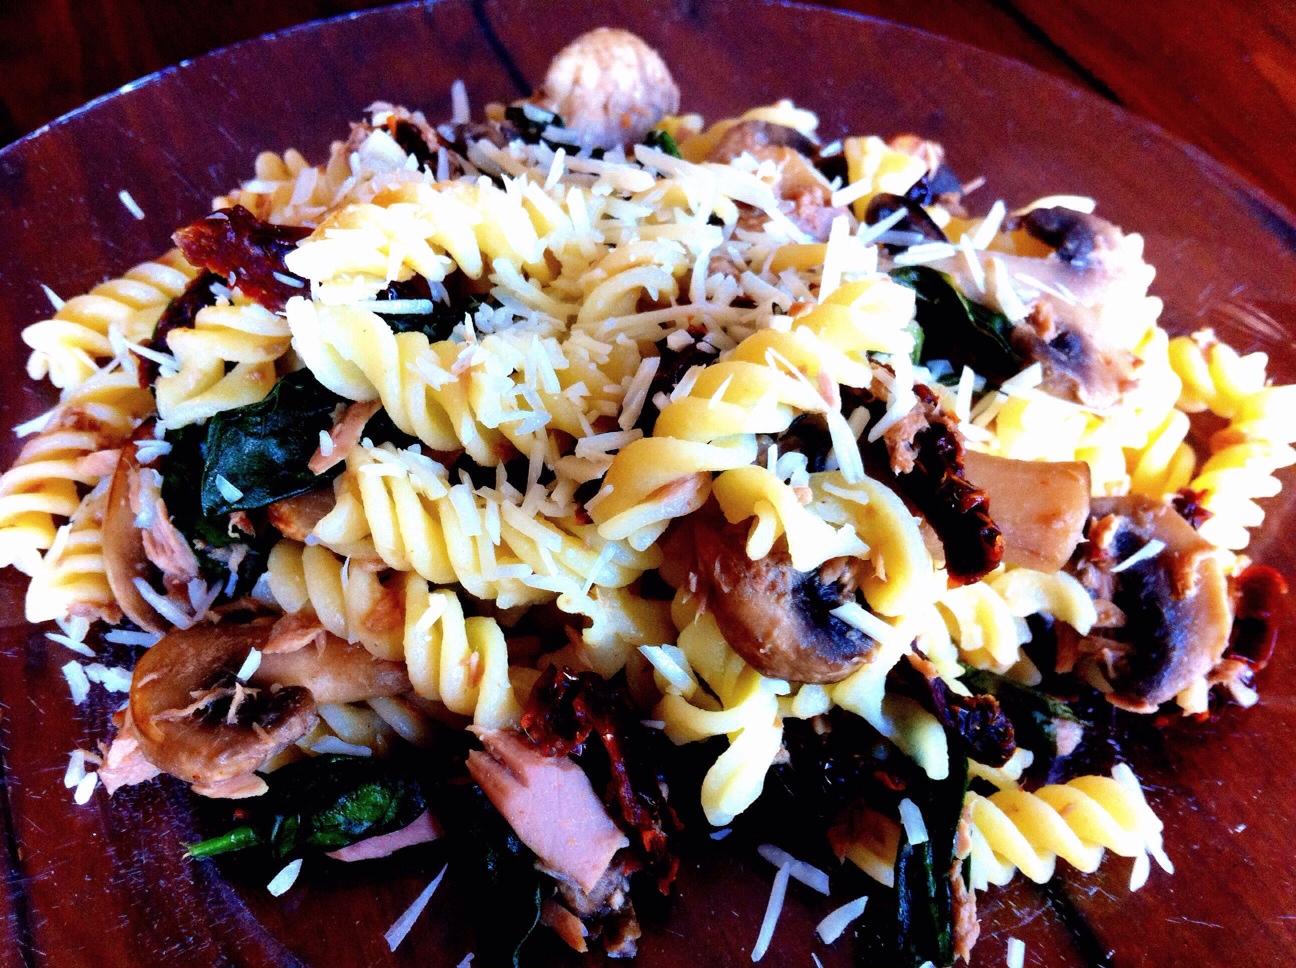 Rotini with Tuna, Mushrooms, Spanich & Sundried Tomatoes